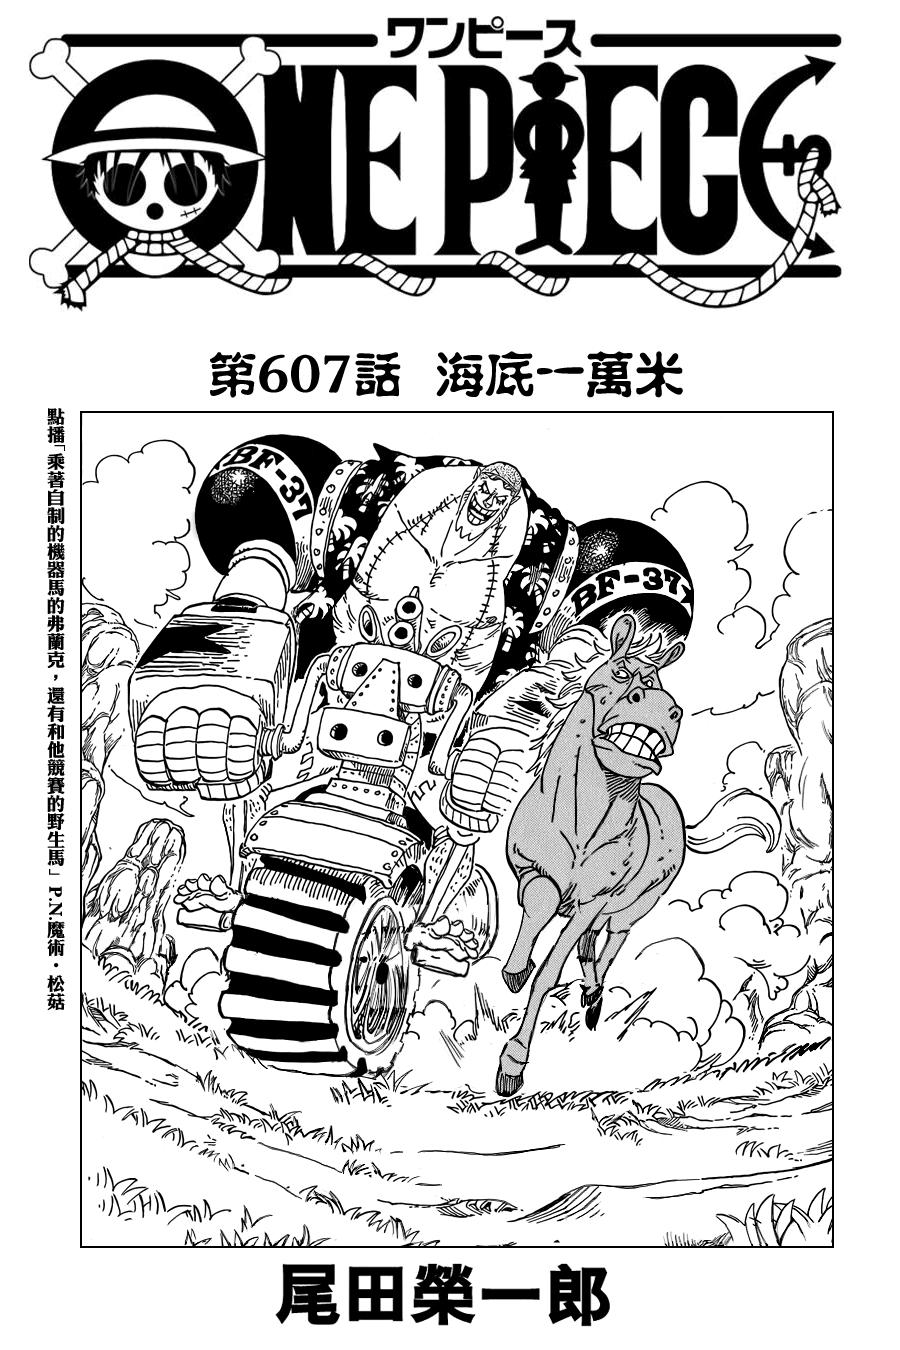 One Piece Manga 607 Spoiler Pics 0113